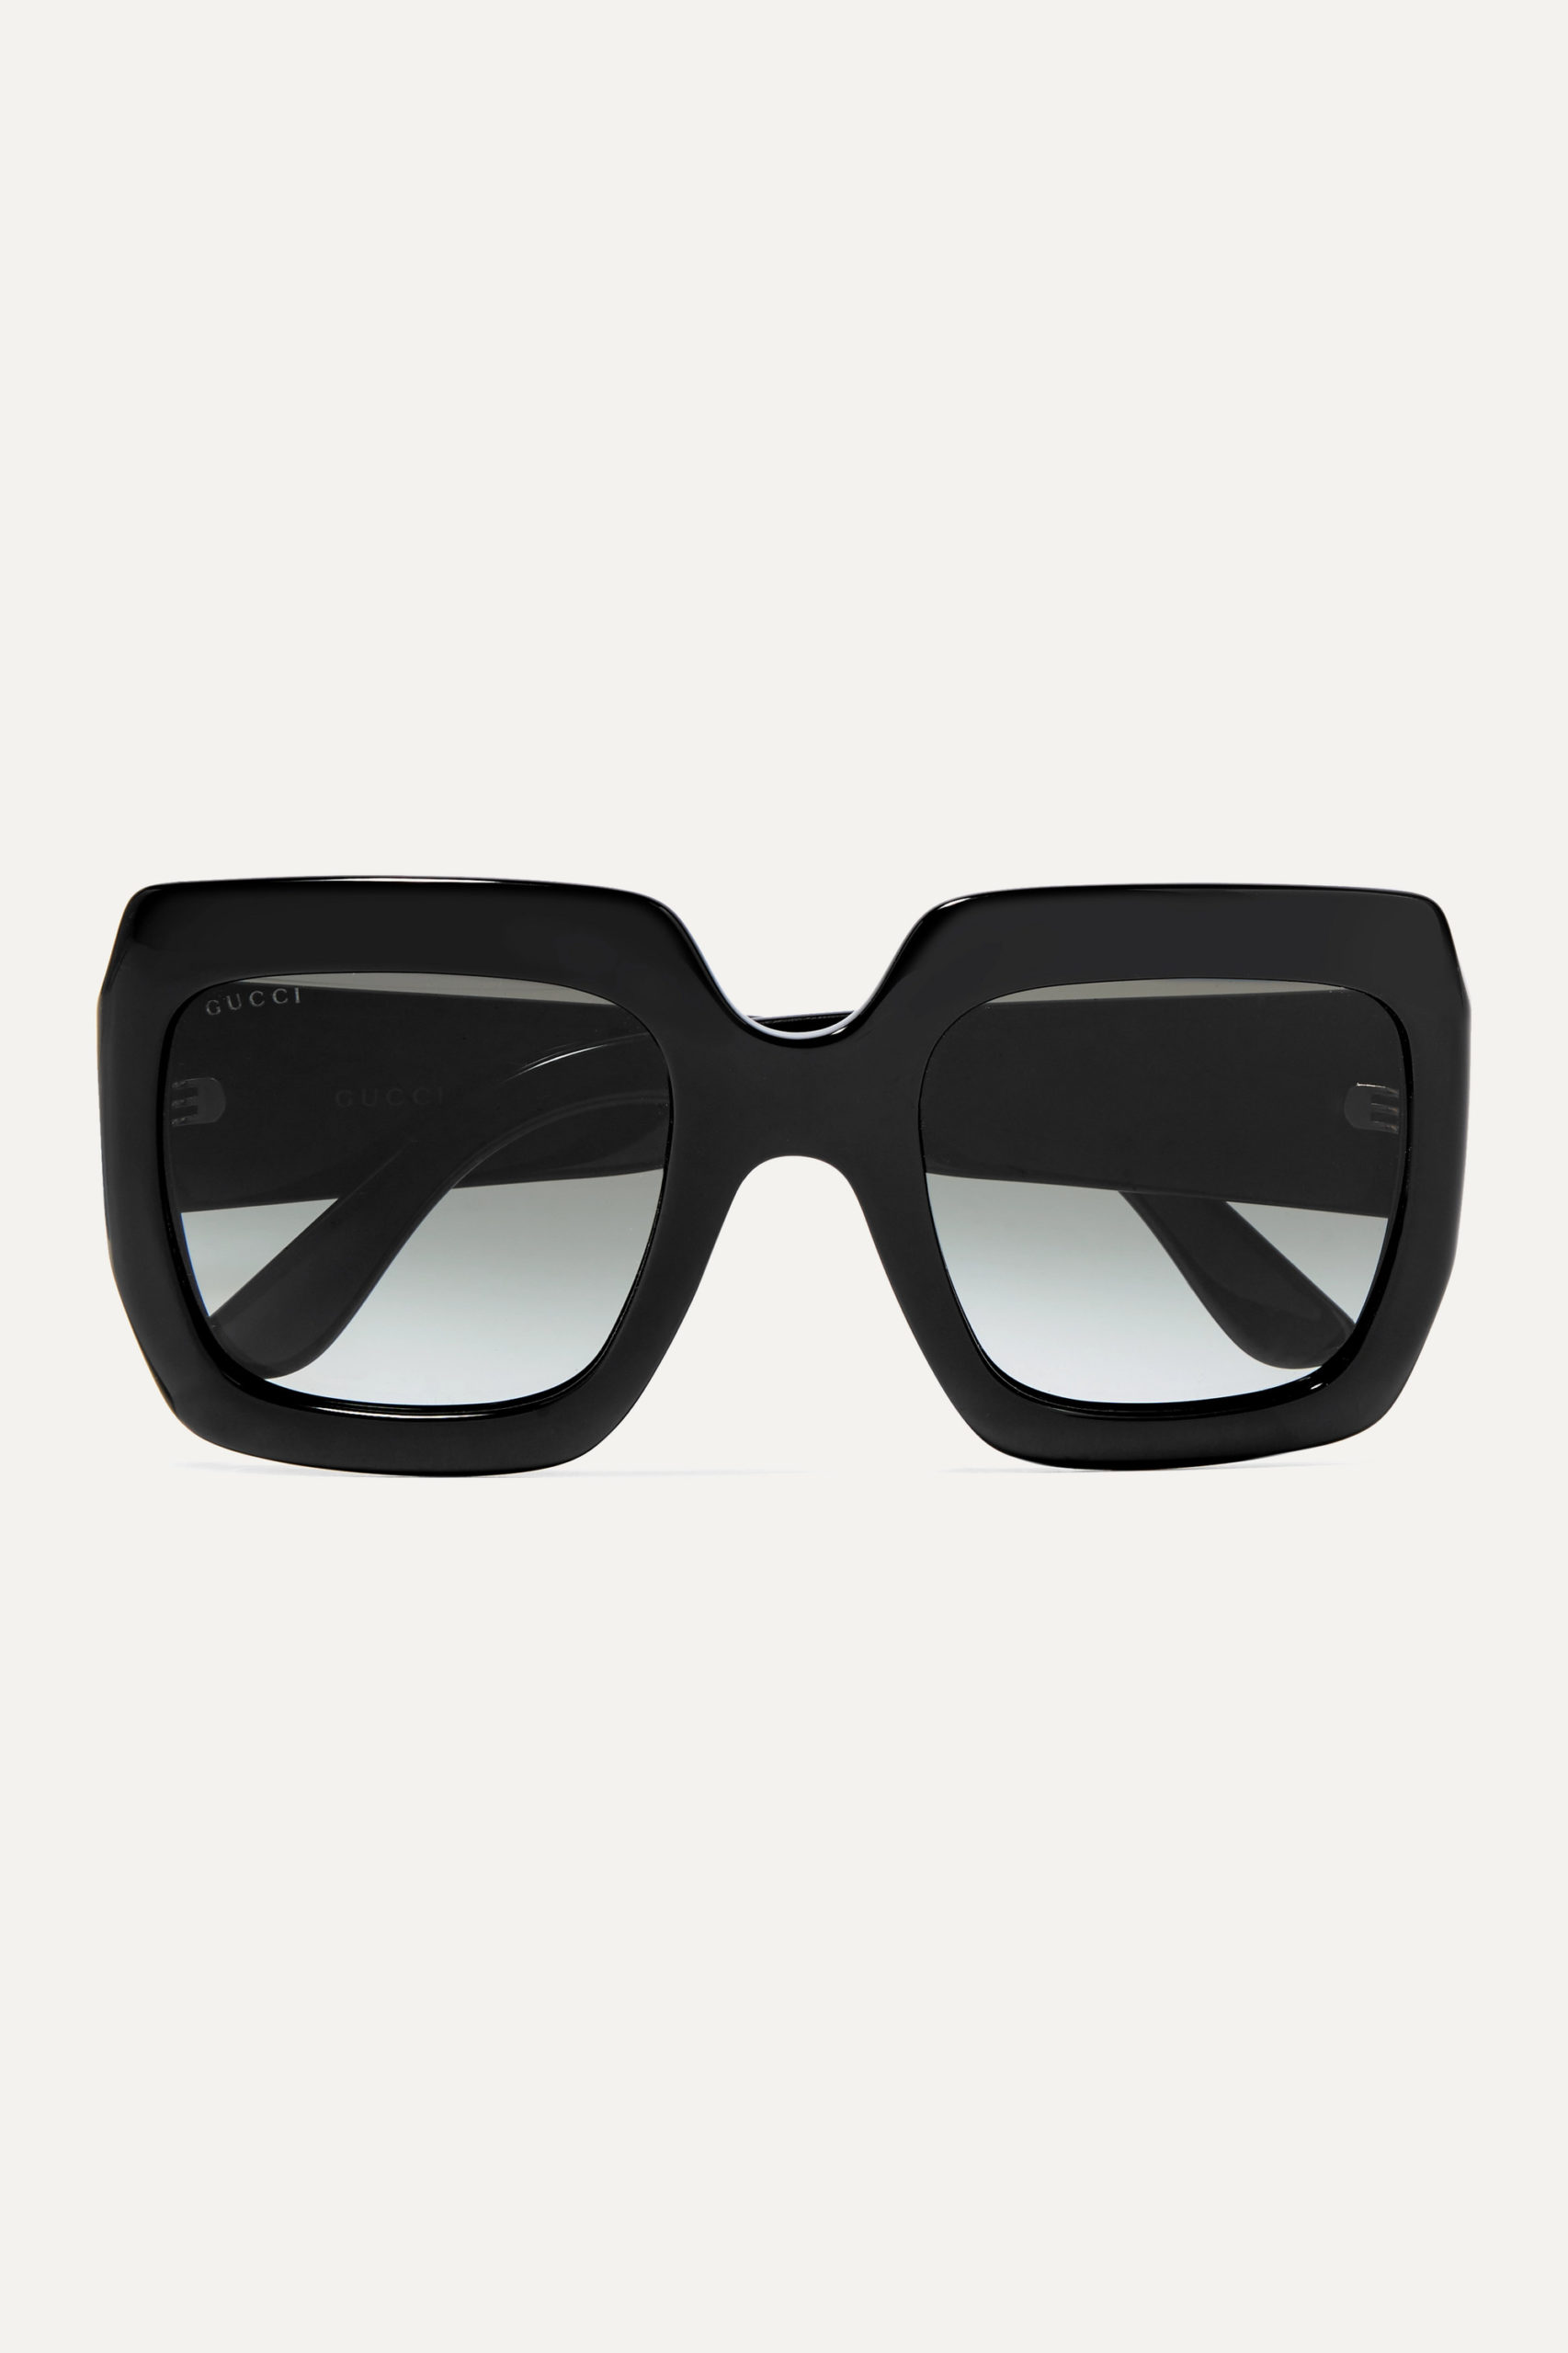 Gucci — Pop Web Sunglasses